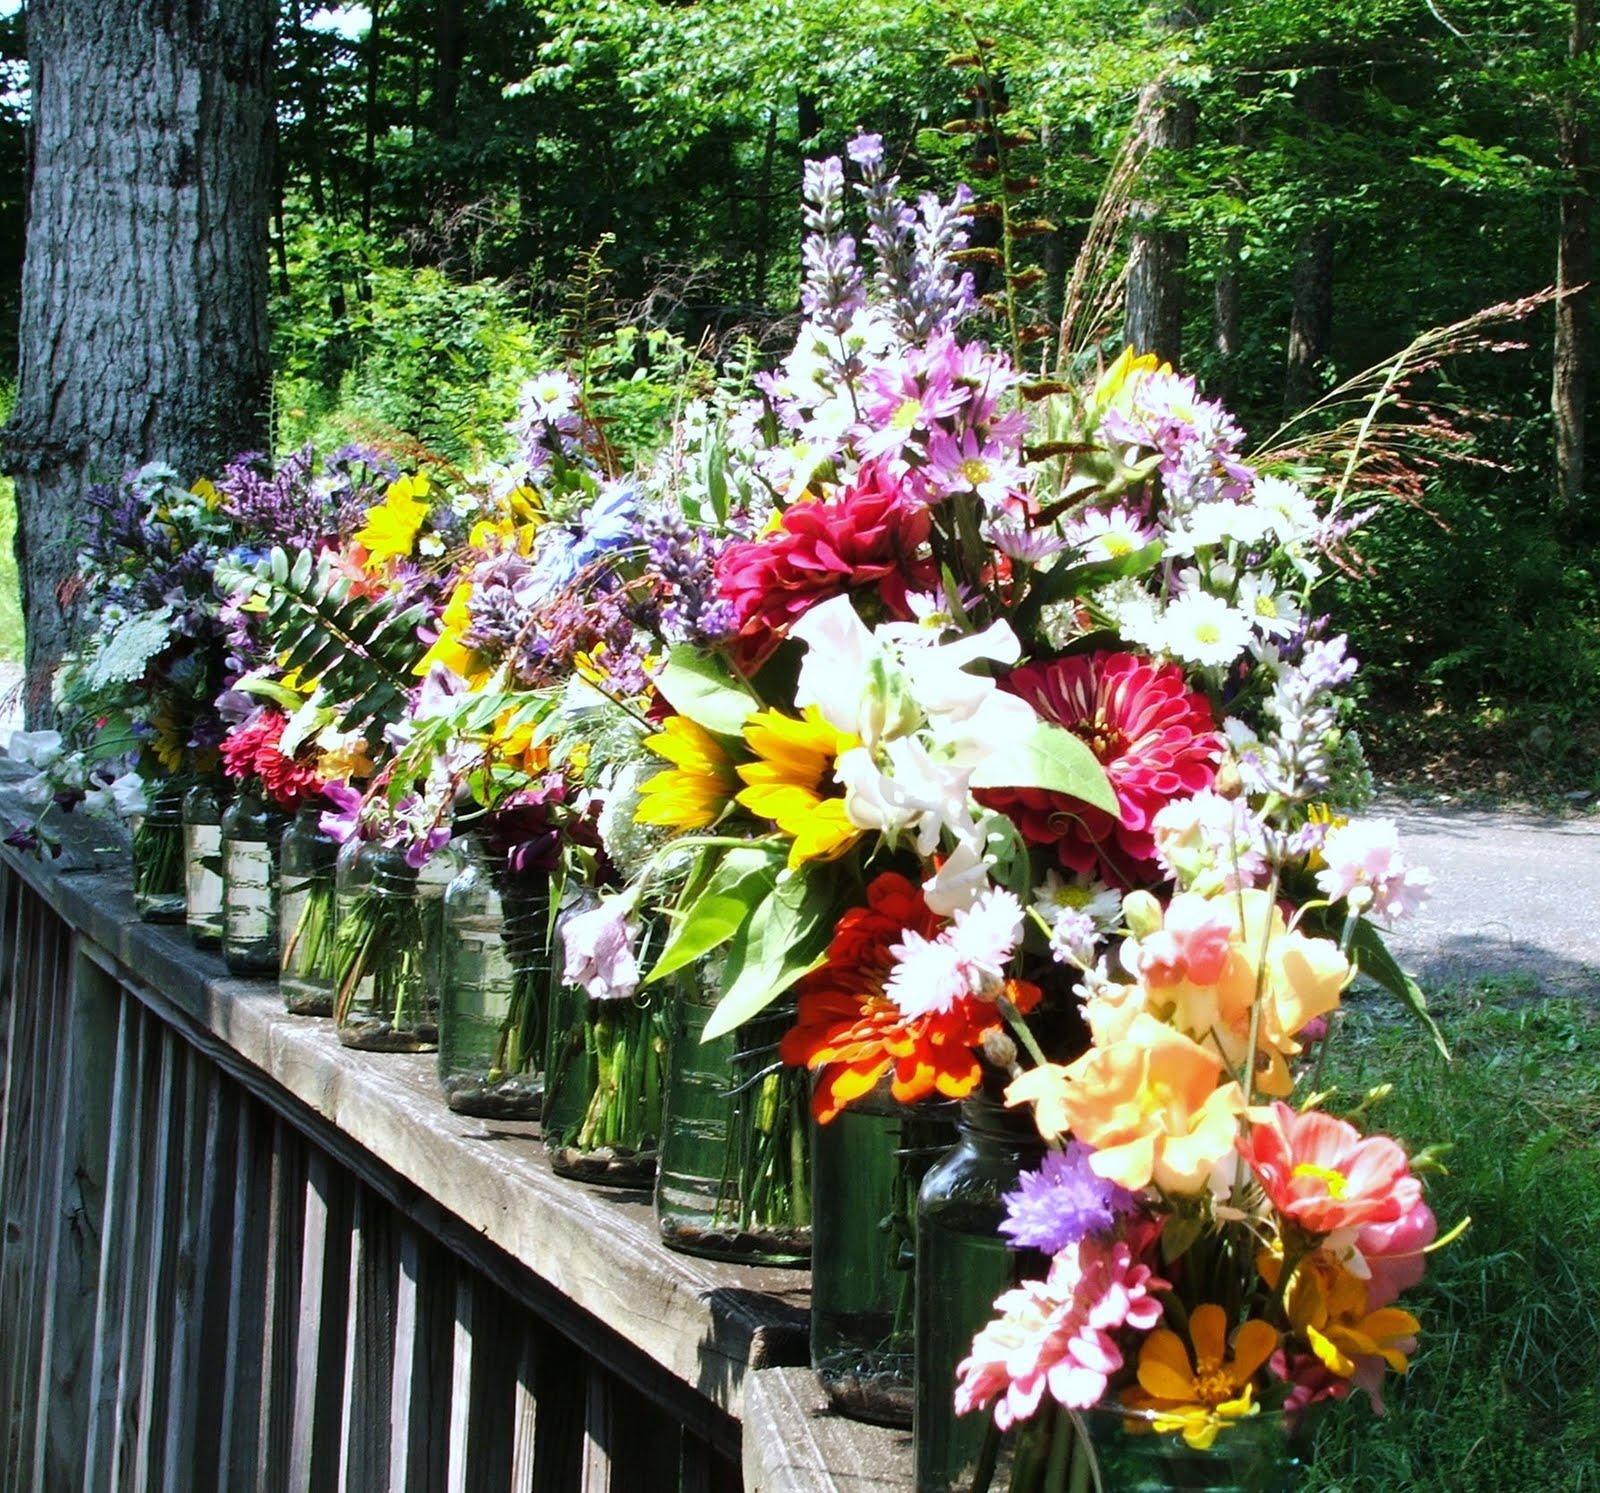 Flowers In Jars Wedding: Adirondack Flower Farm: Mason Jar Flowers